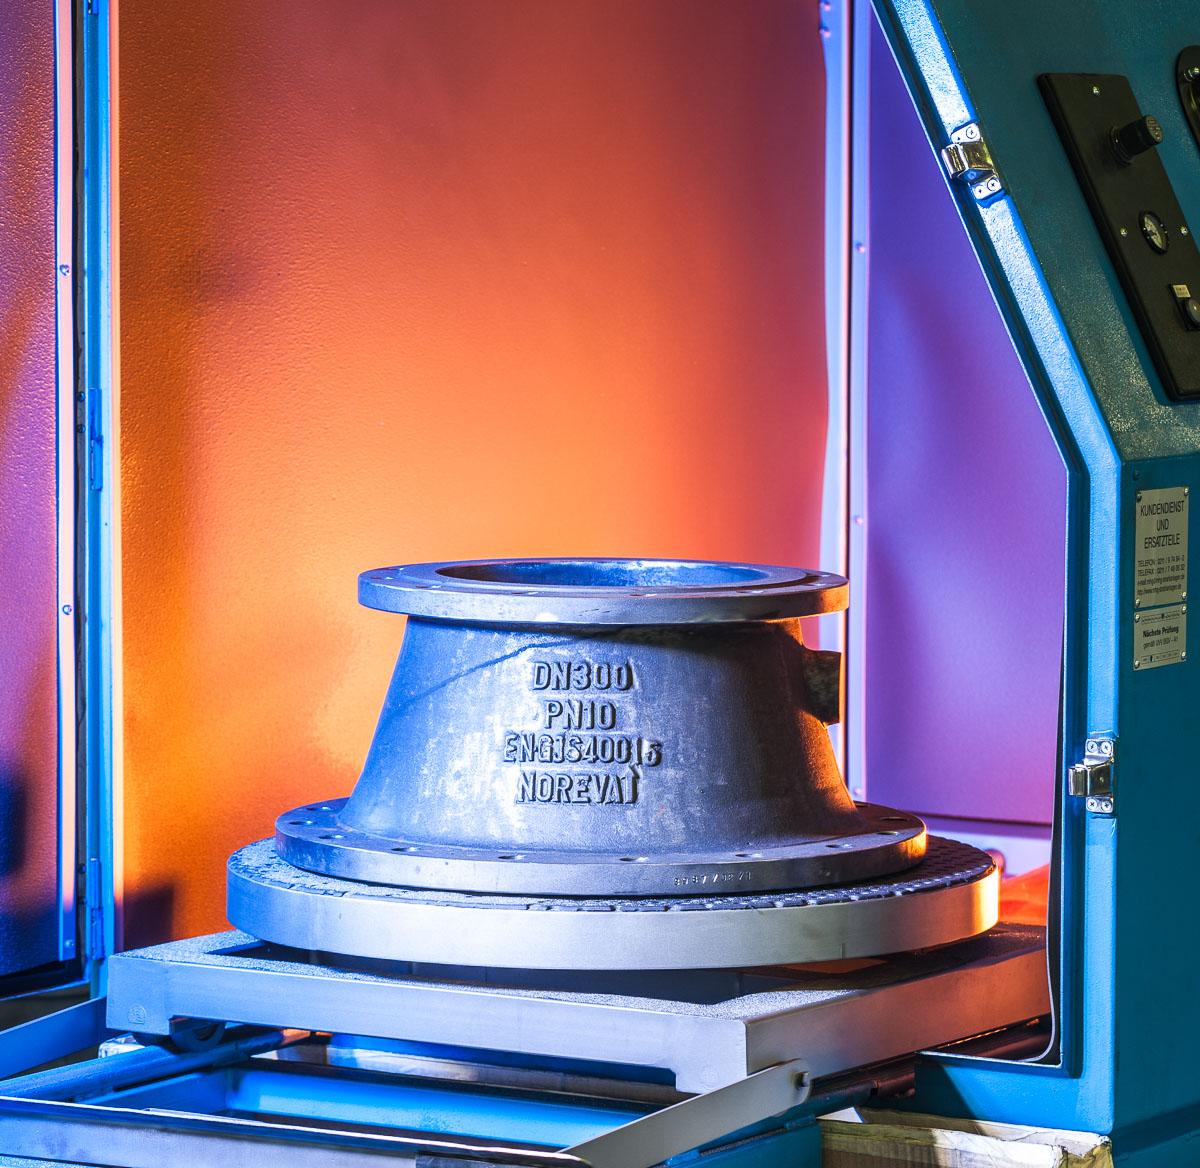 Industriefoto Maschine Fotograf Lothar Drechsel Mönchengladbach